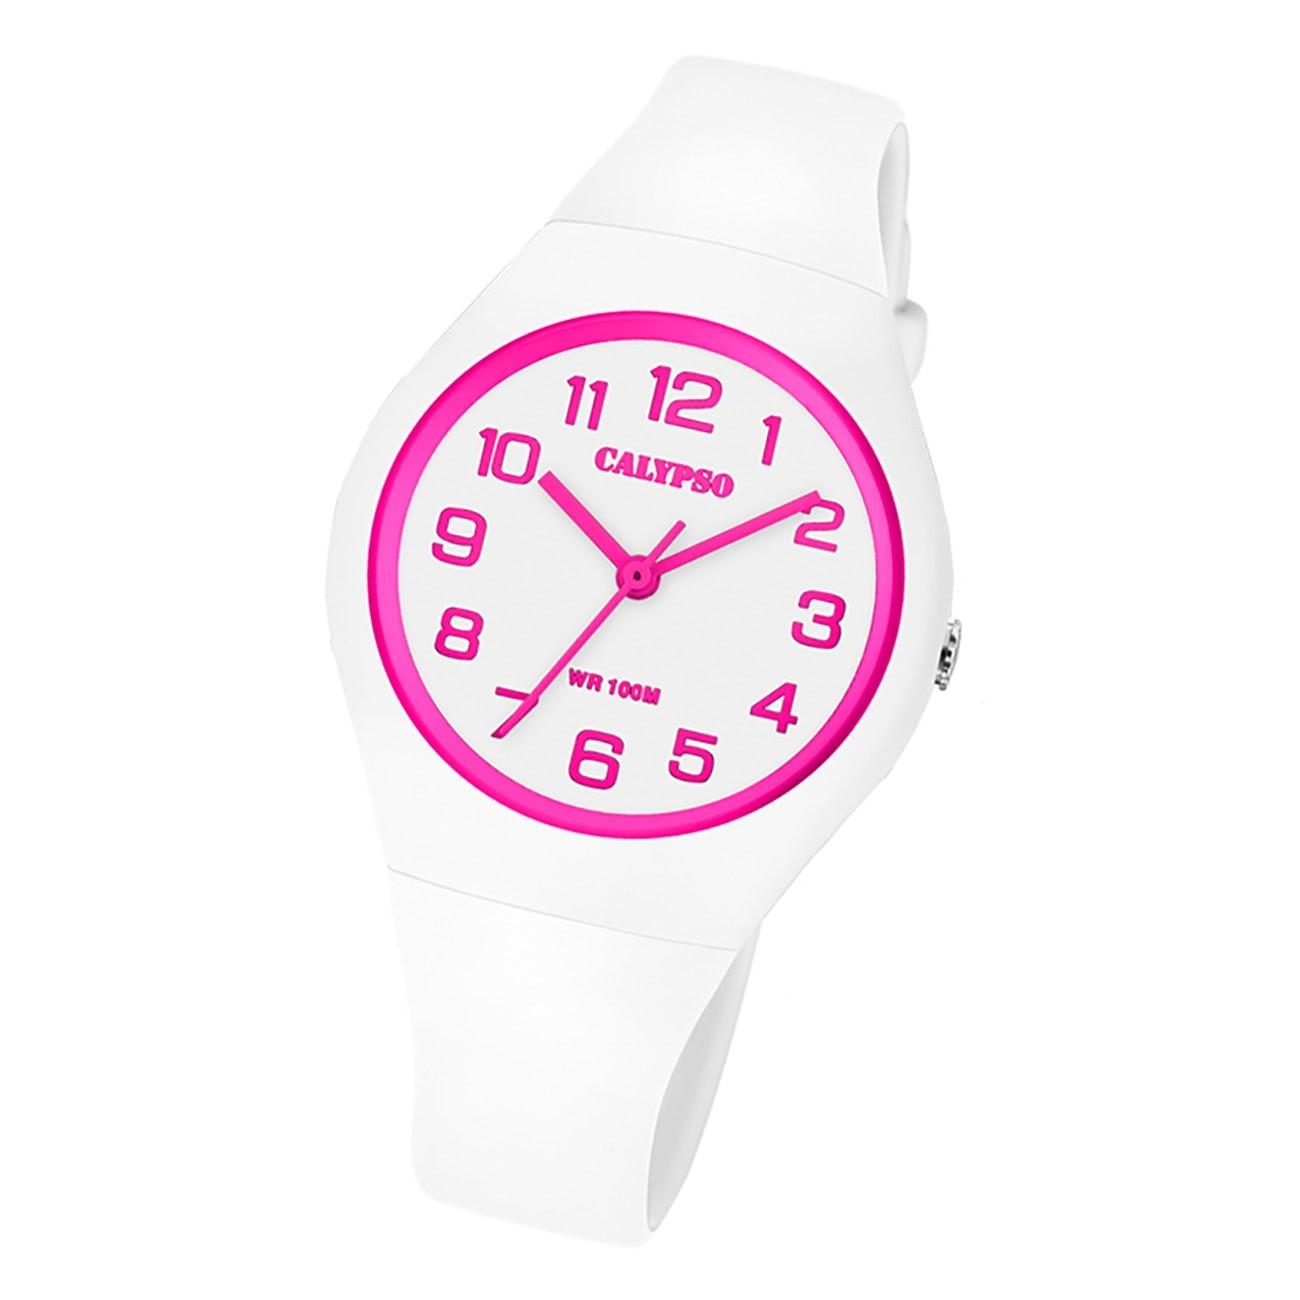 Calypso Damen Jugend Armbanduhr Fashion K5777/5 Analog Kunststoff weiß UK5777/5